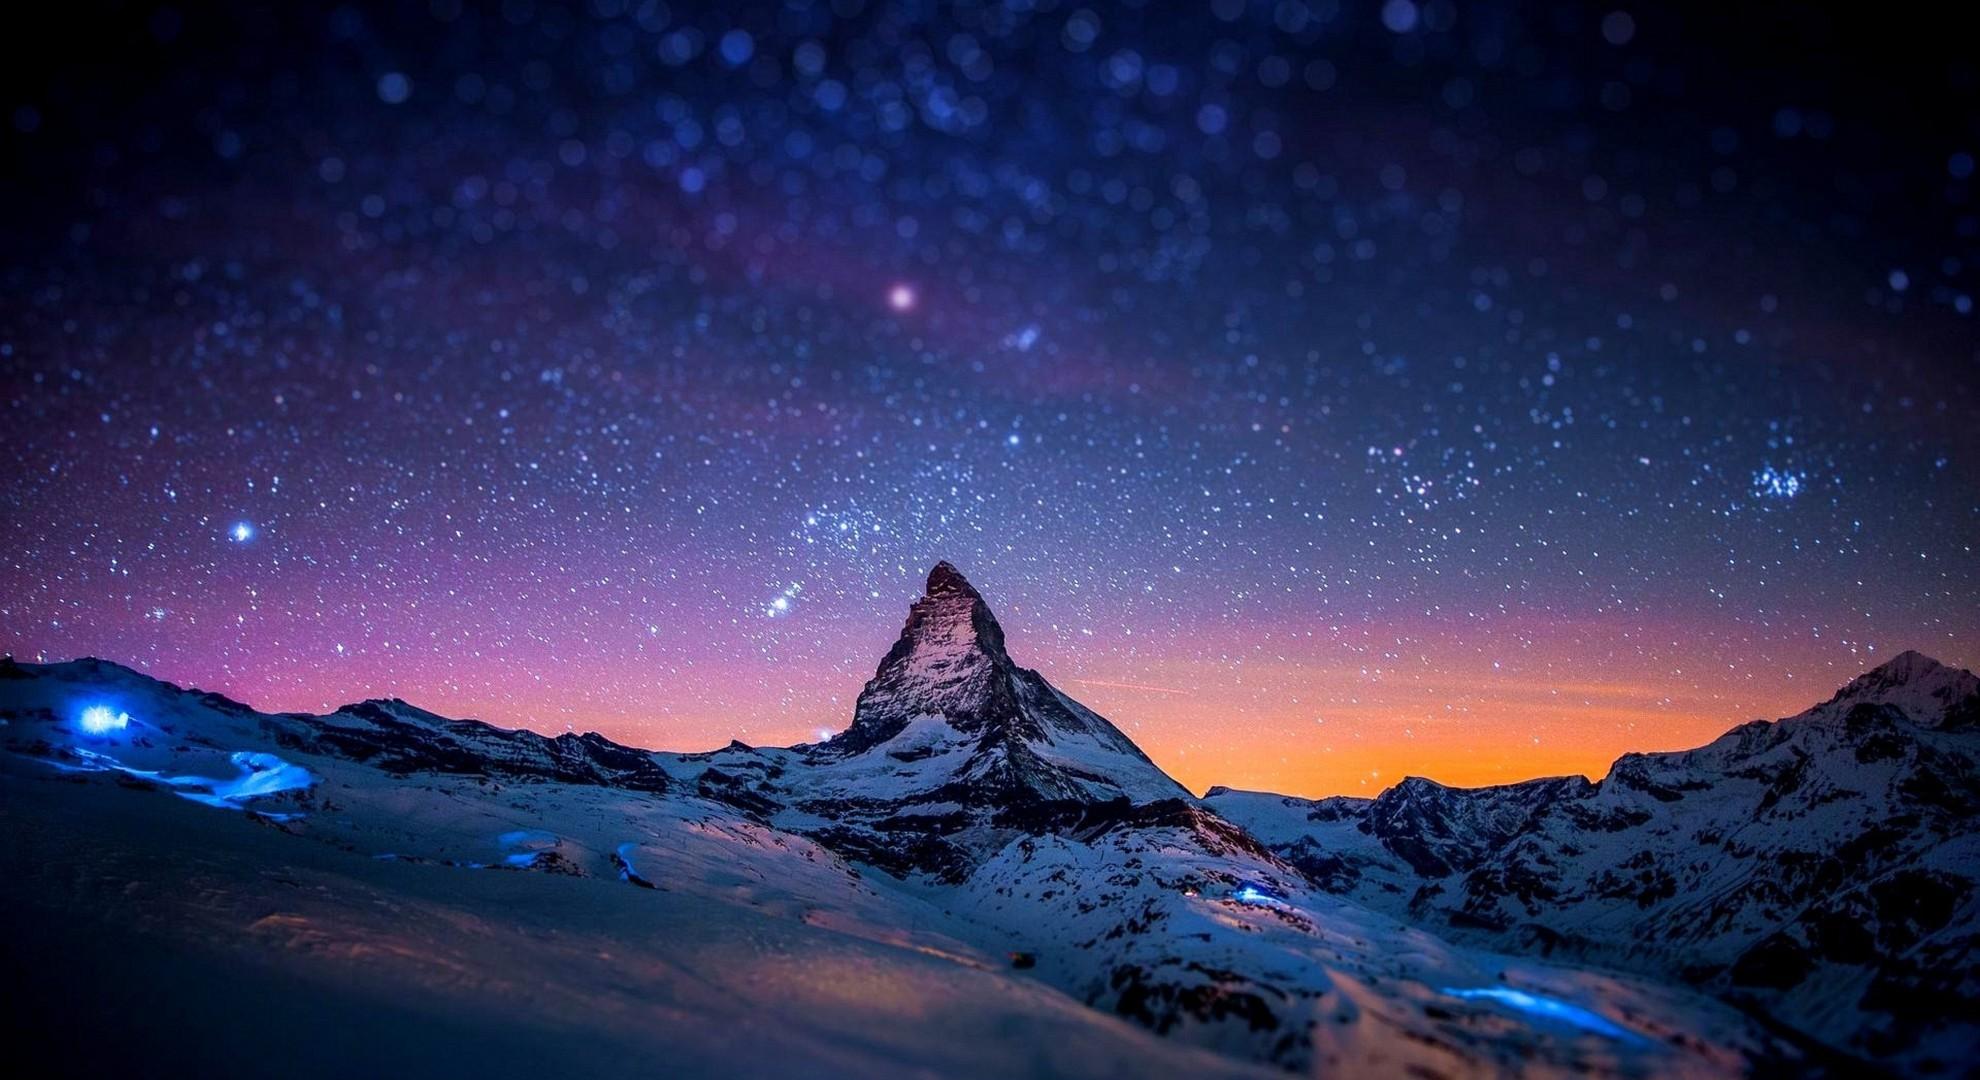 Mountain Night Stars Winter Lights Bokeh   Macbook 1980x1080